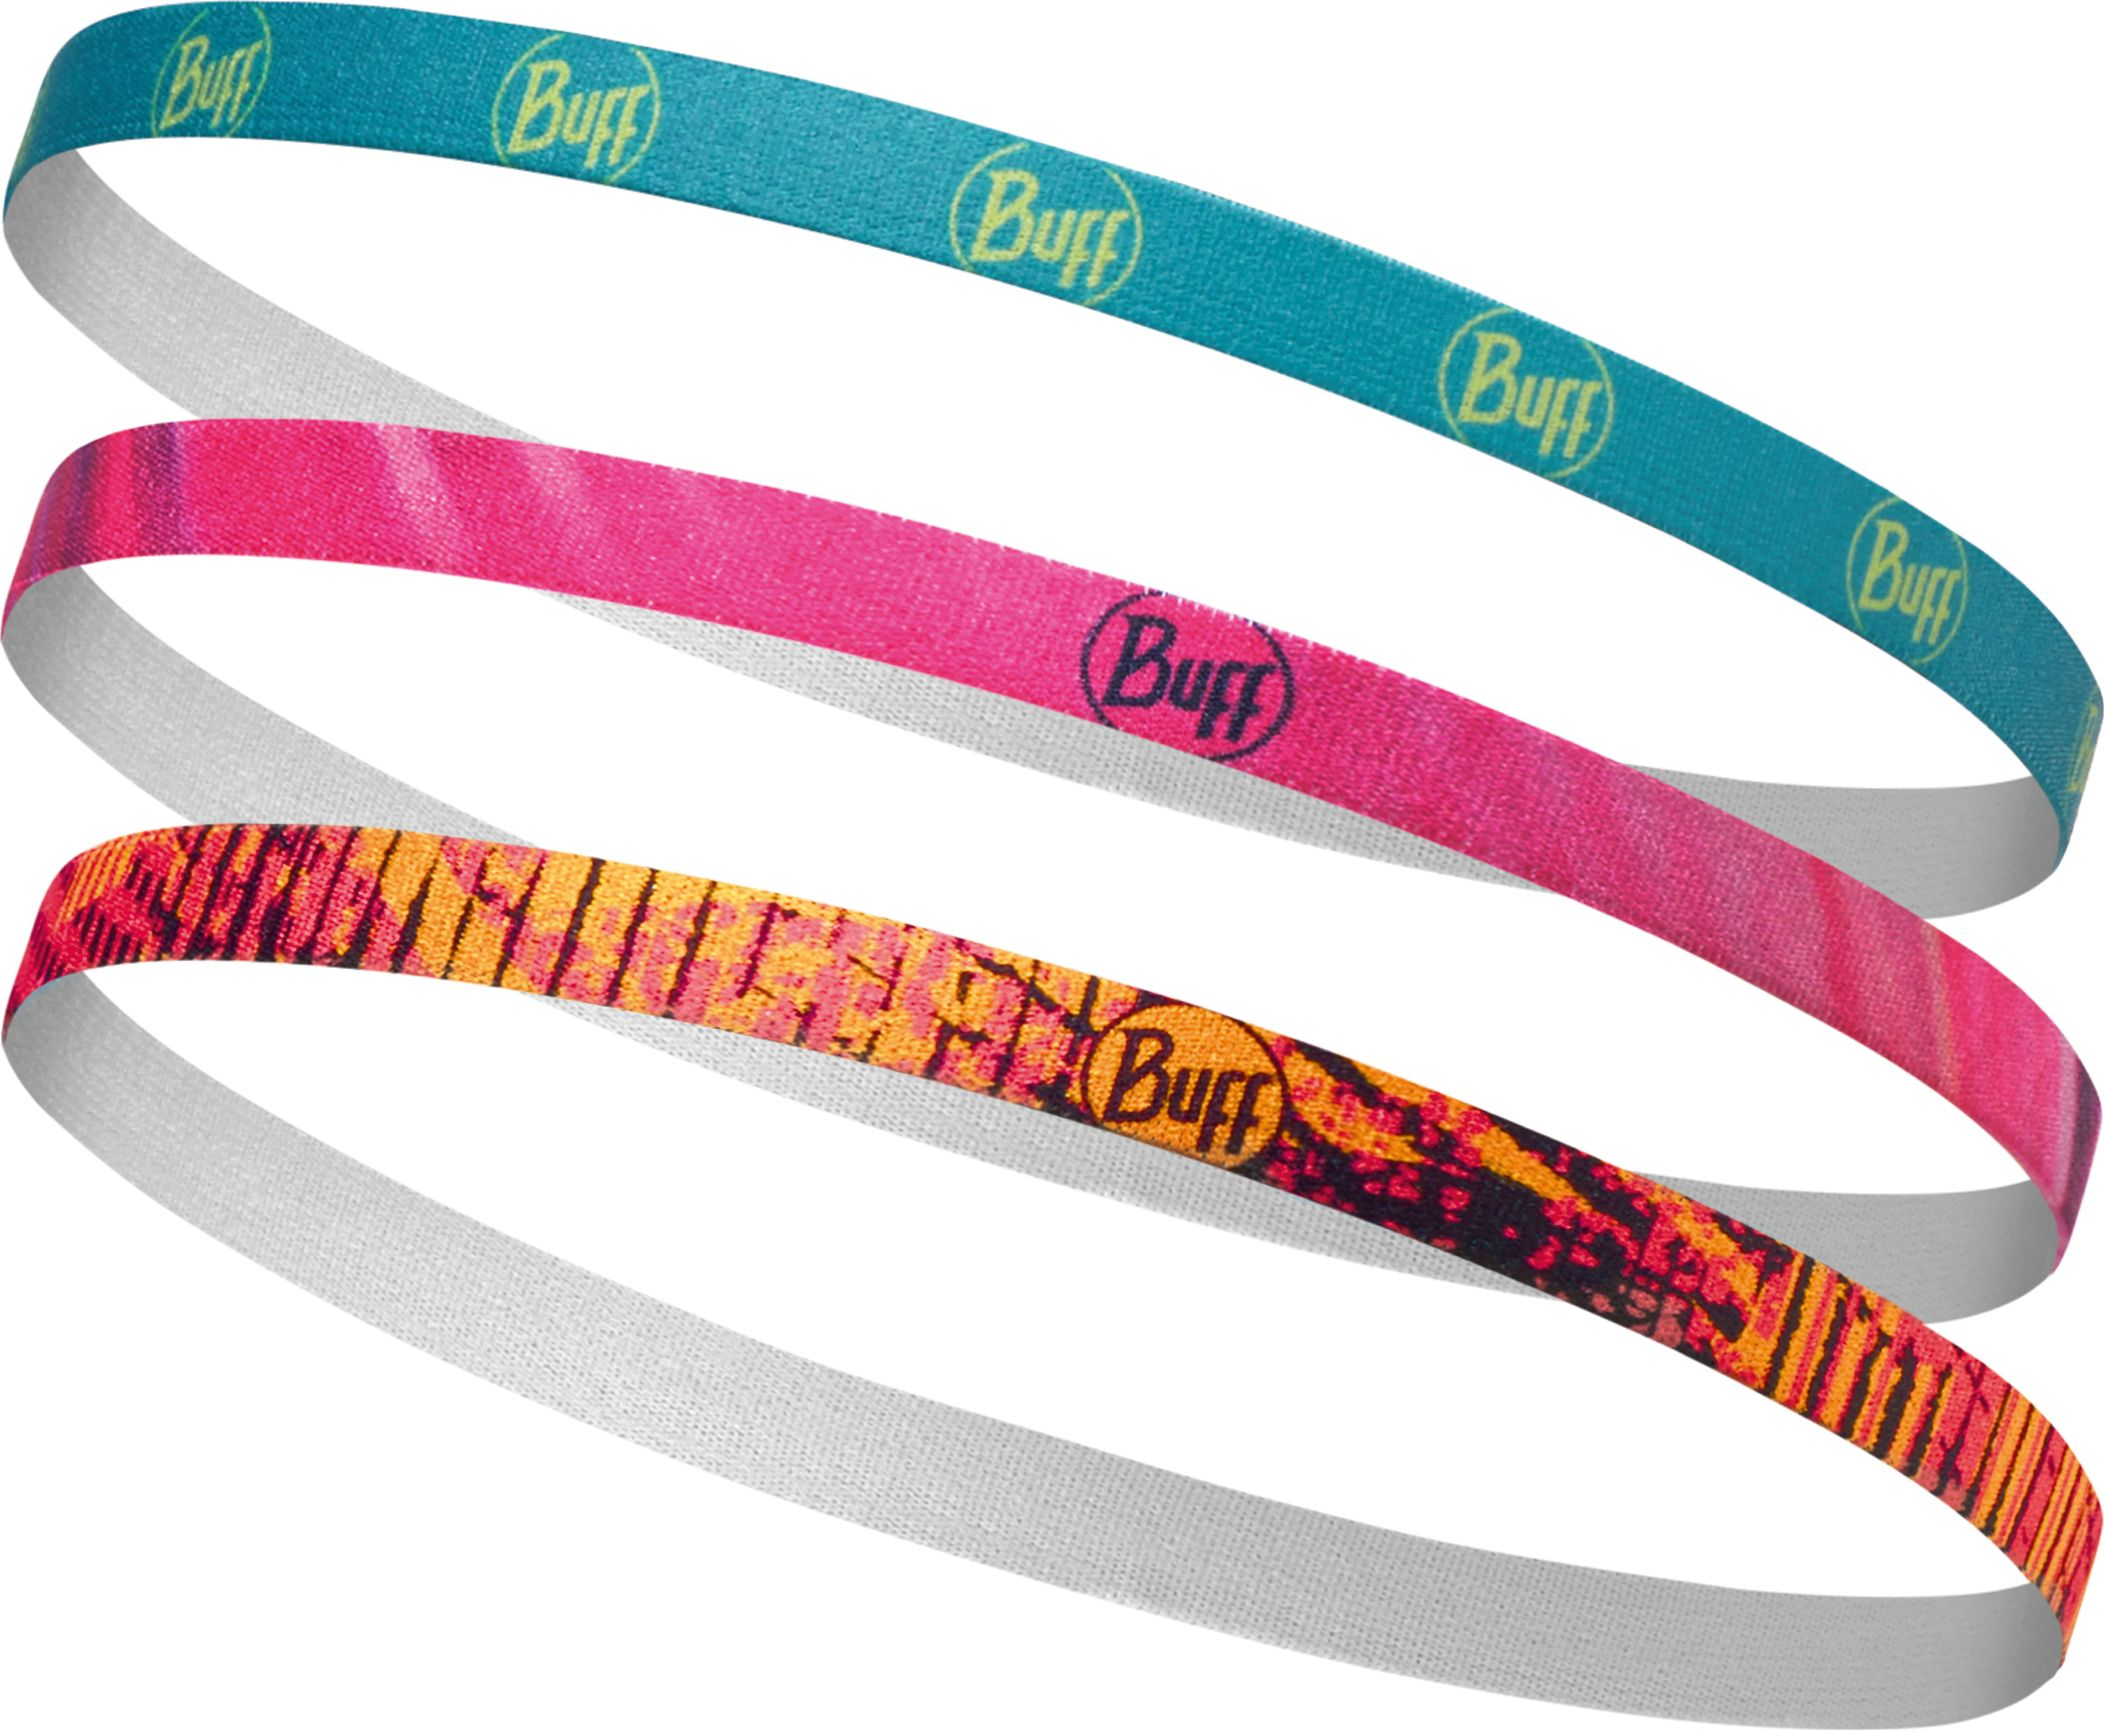 Повязка Buff Hairband Iris Multi, цвет: разноцветный. 117094.555.10.00